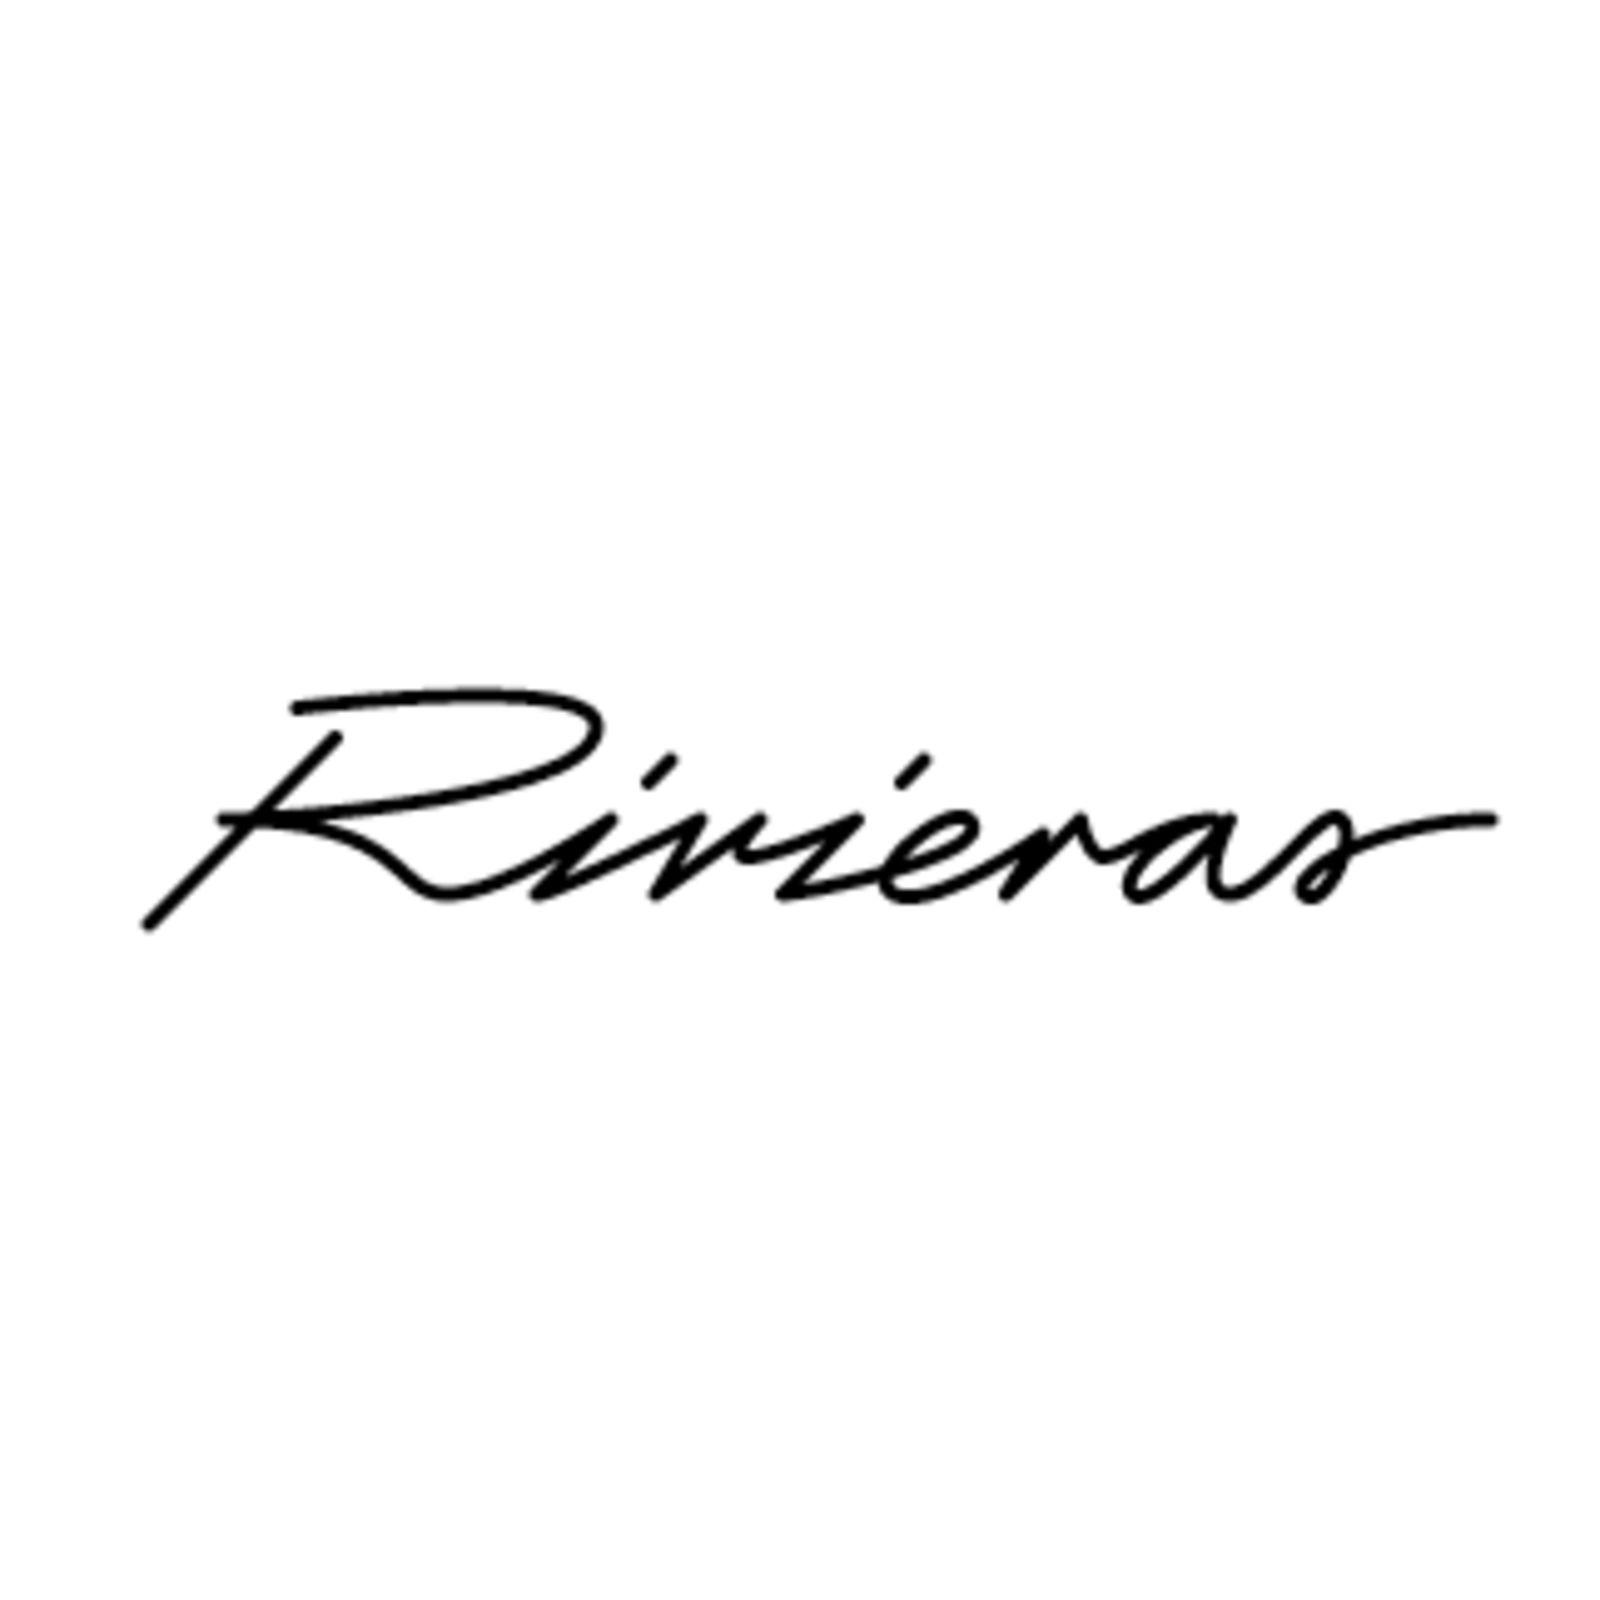 Rivieras (Image 1)